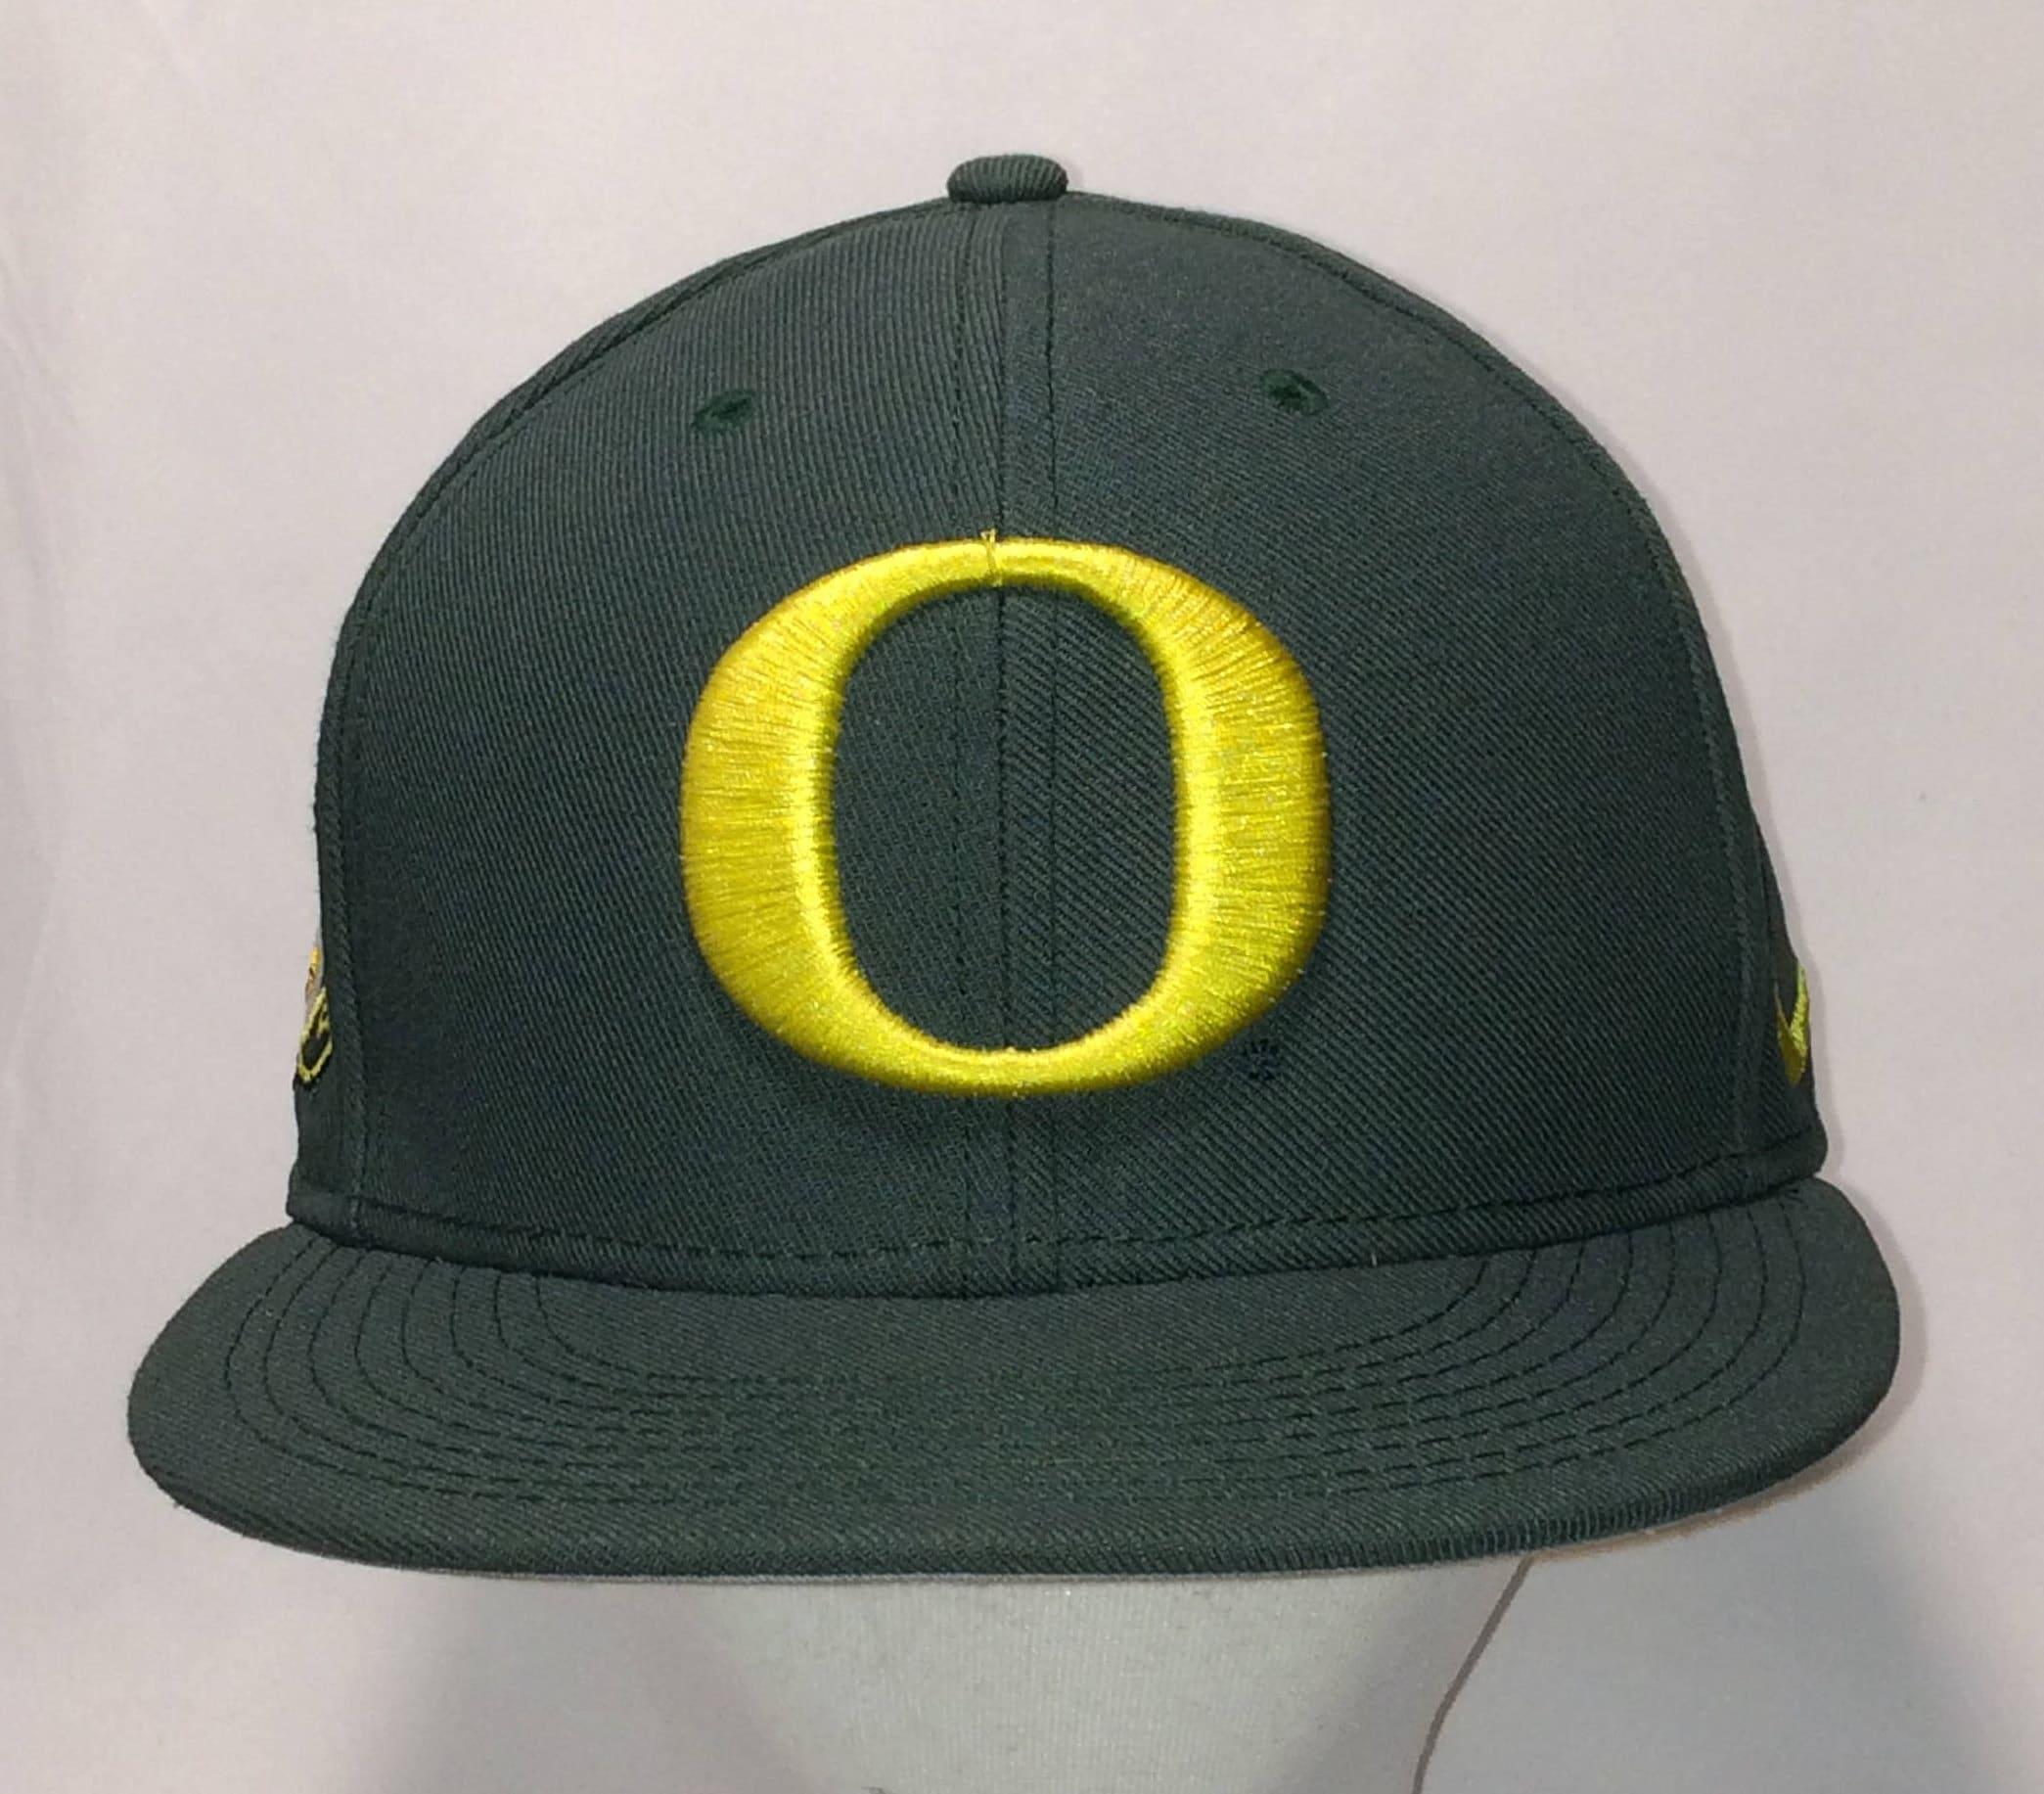 University of Oregon Ducks Baseball Cap Nike Snapback Hat  376405b4103